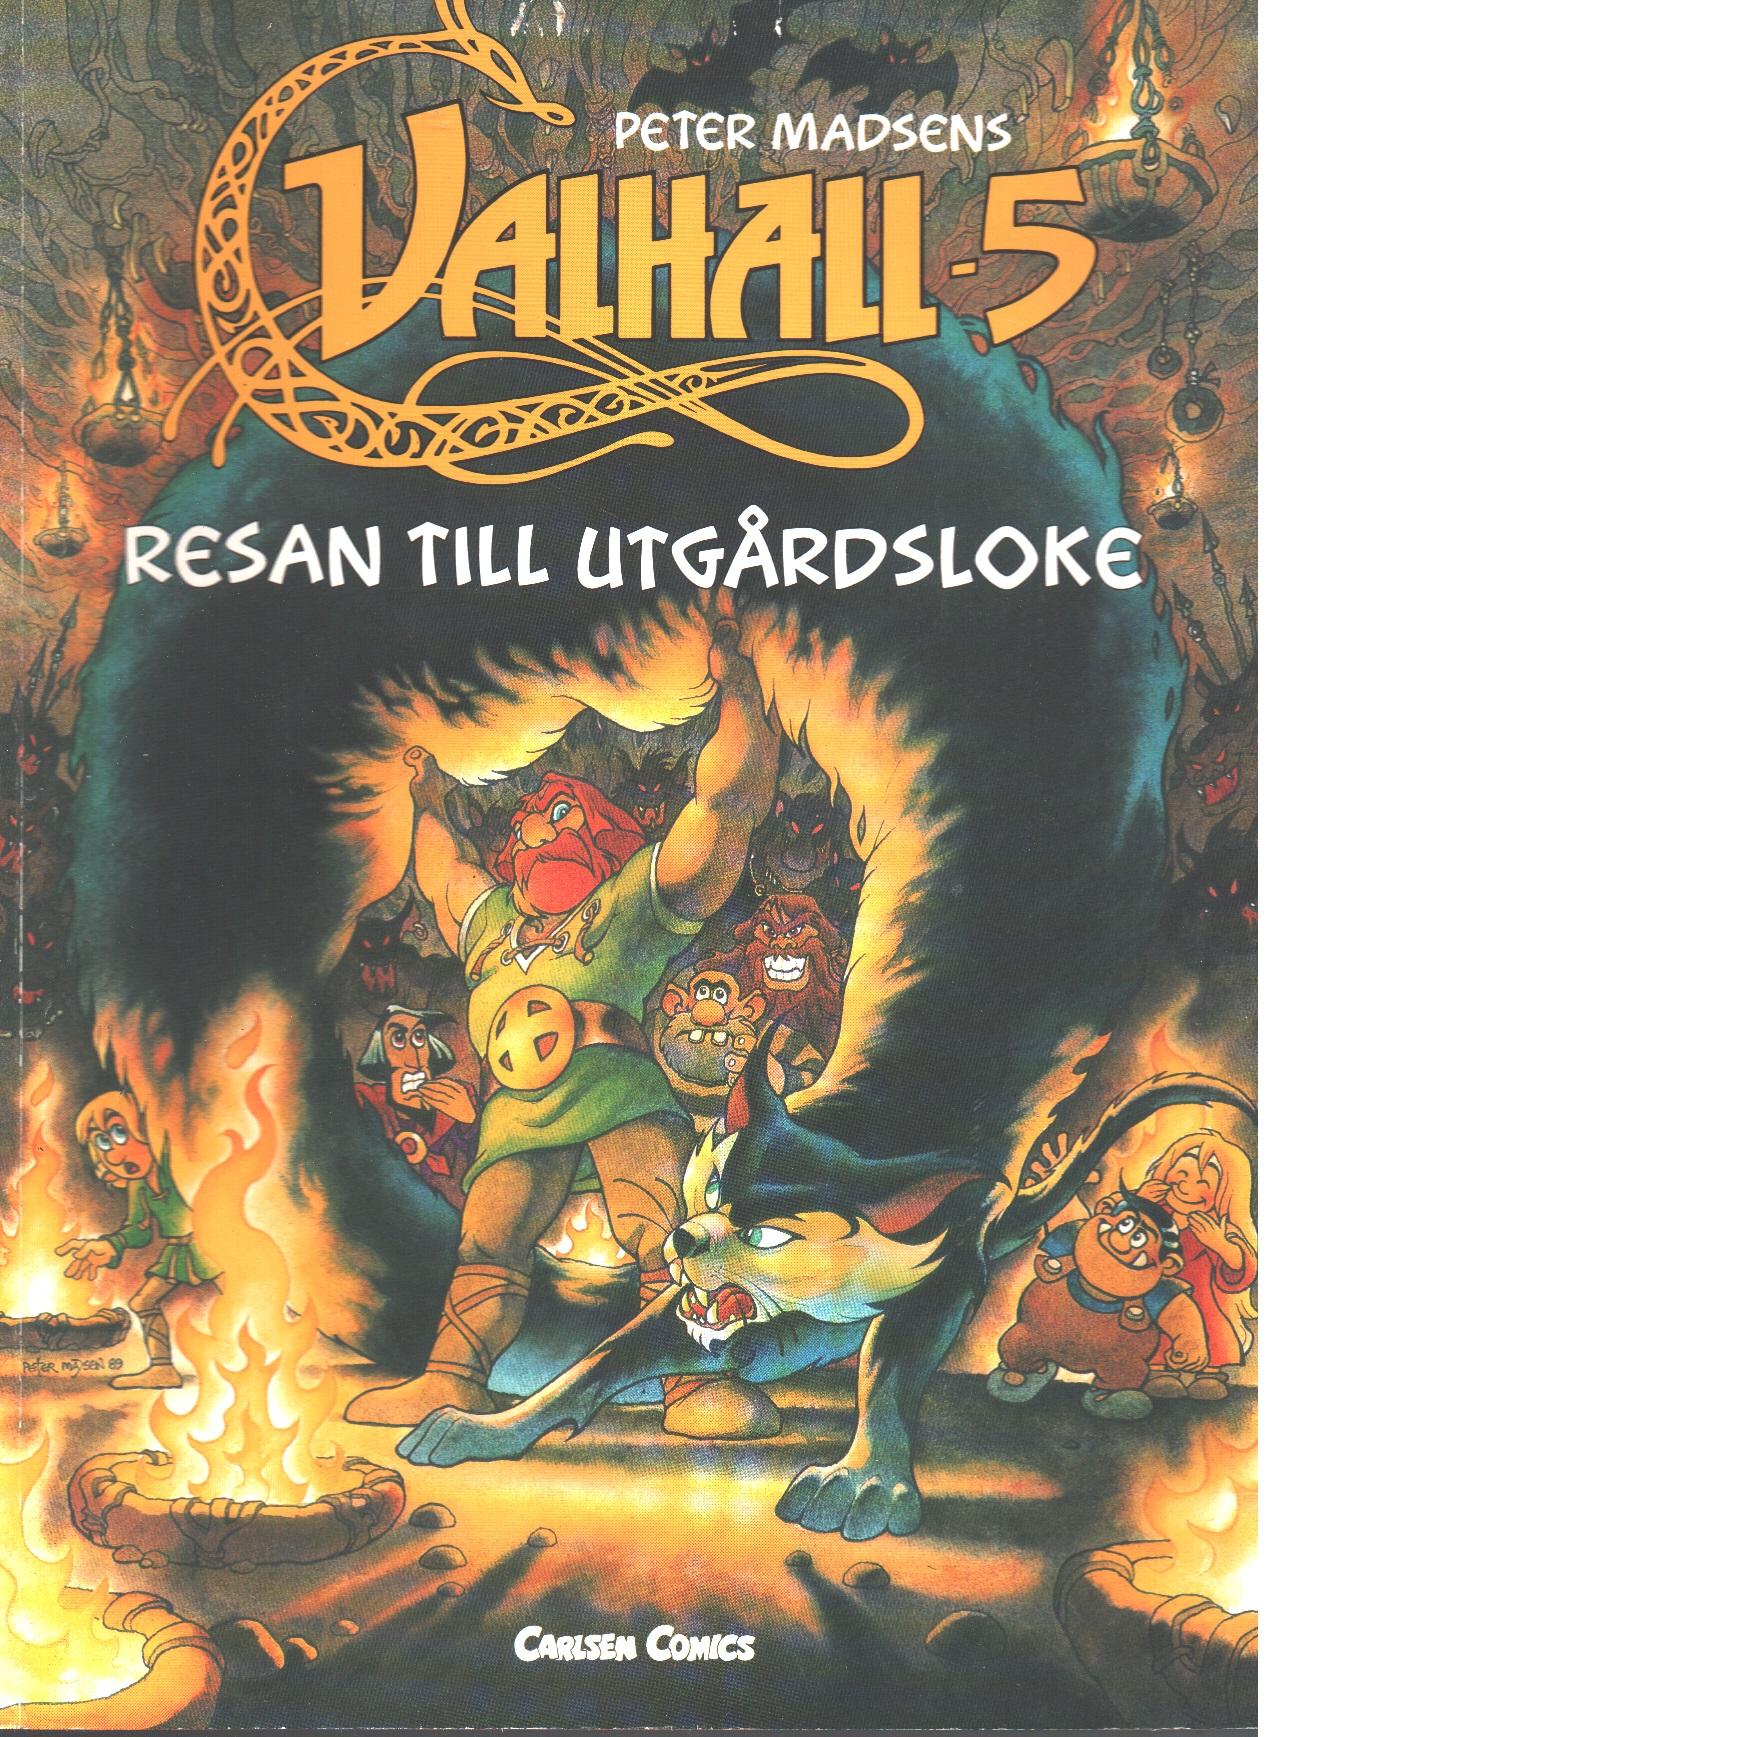 Resan till Utgårdsloke  Valhall 5 - Madsens,  Peter